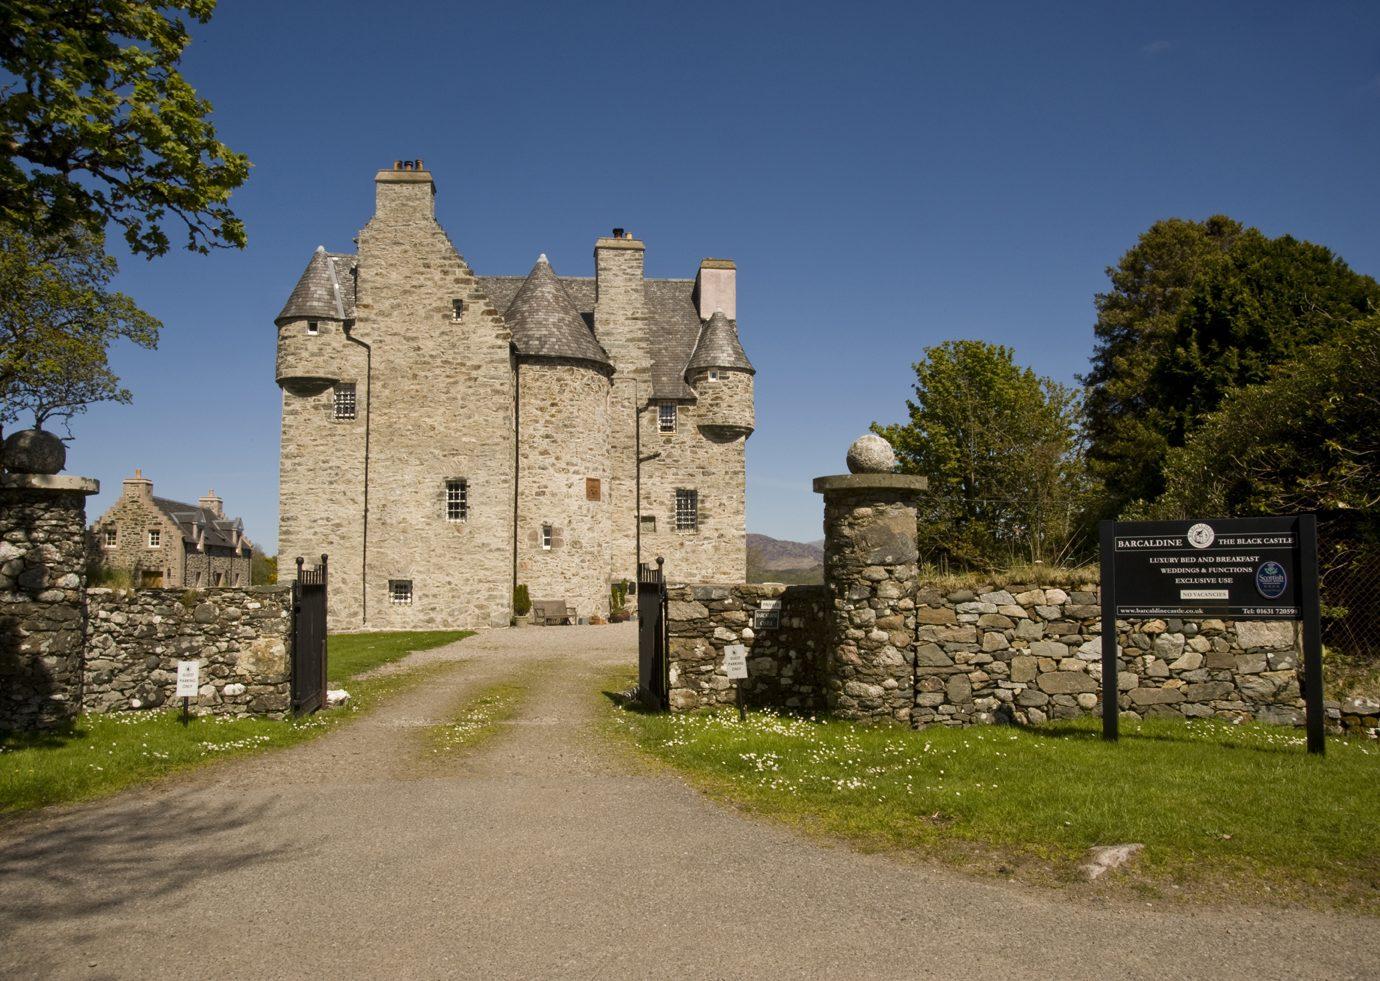 View of Barcaldine castle